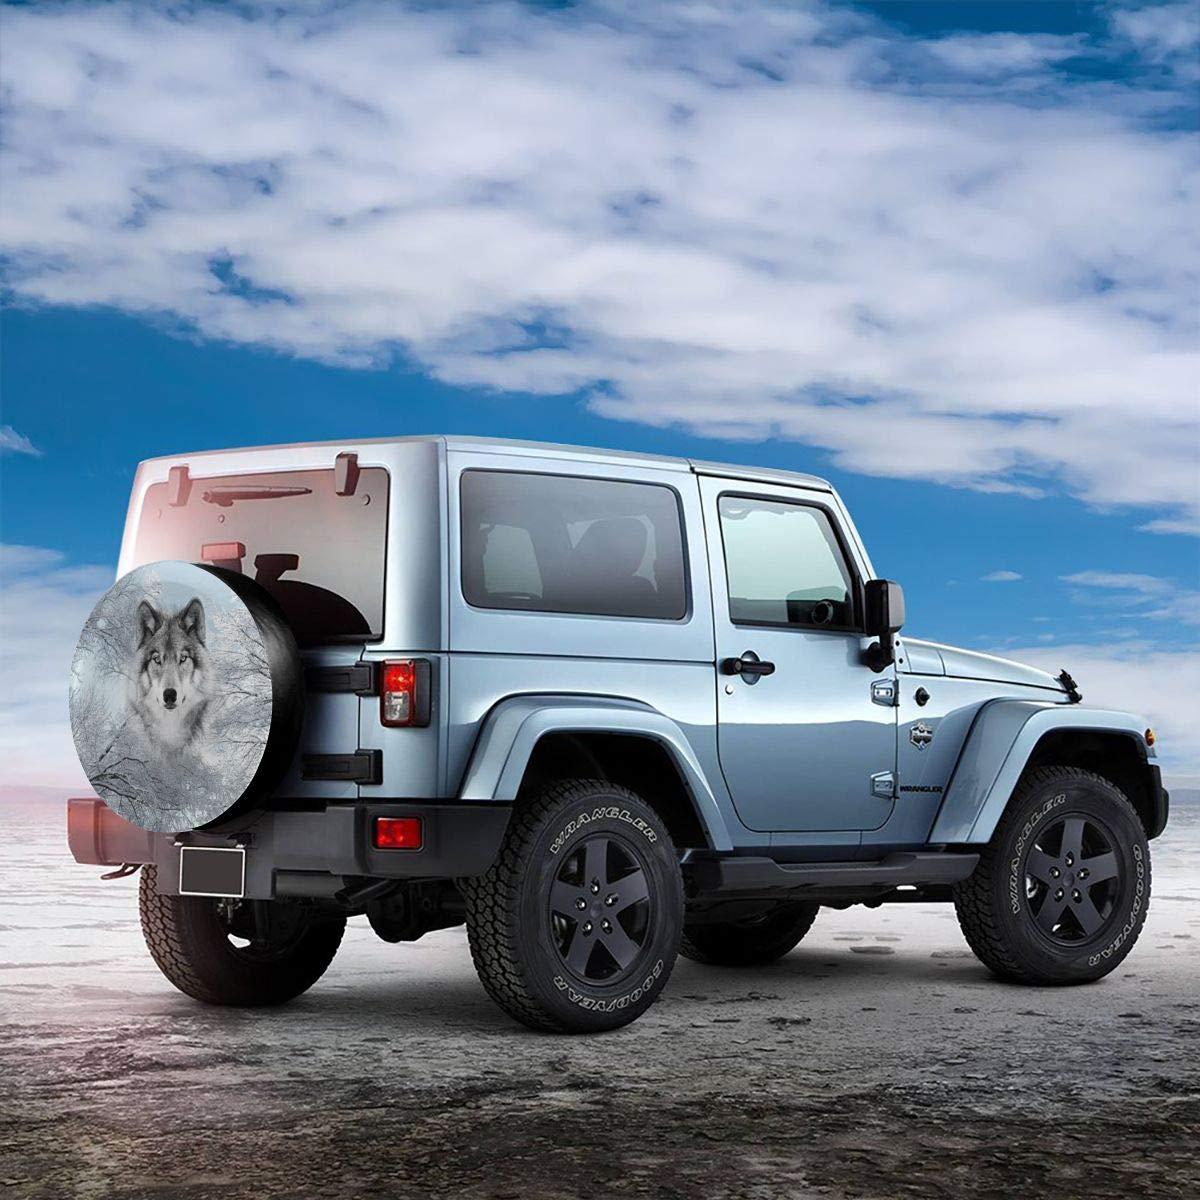 14 15 16 17 Inch PecoStar Snow Wolf Spare Wheel Tire Cover Fit For Truck Camper Van Jeep Trailer RV SUV Trailer Accessories